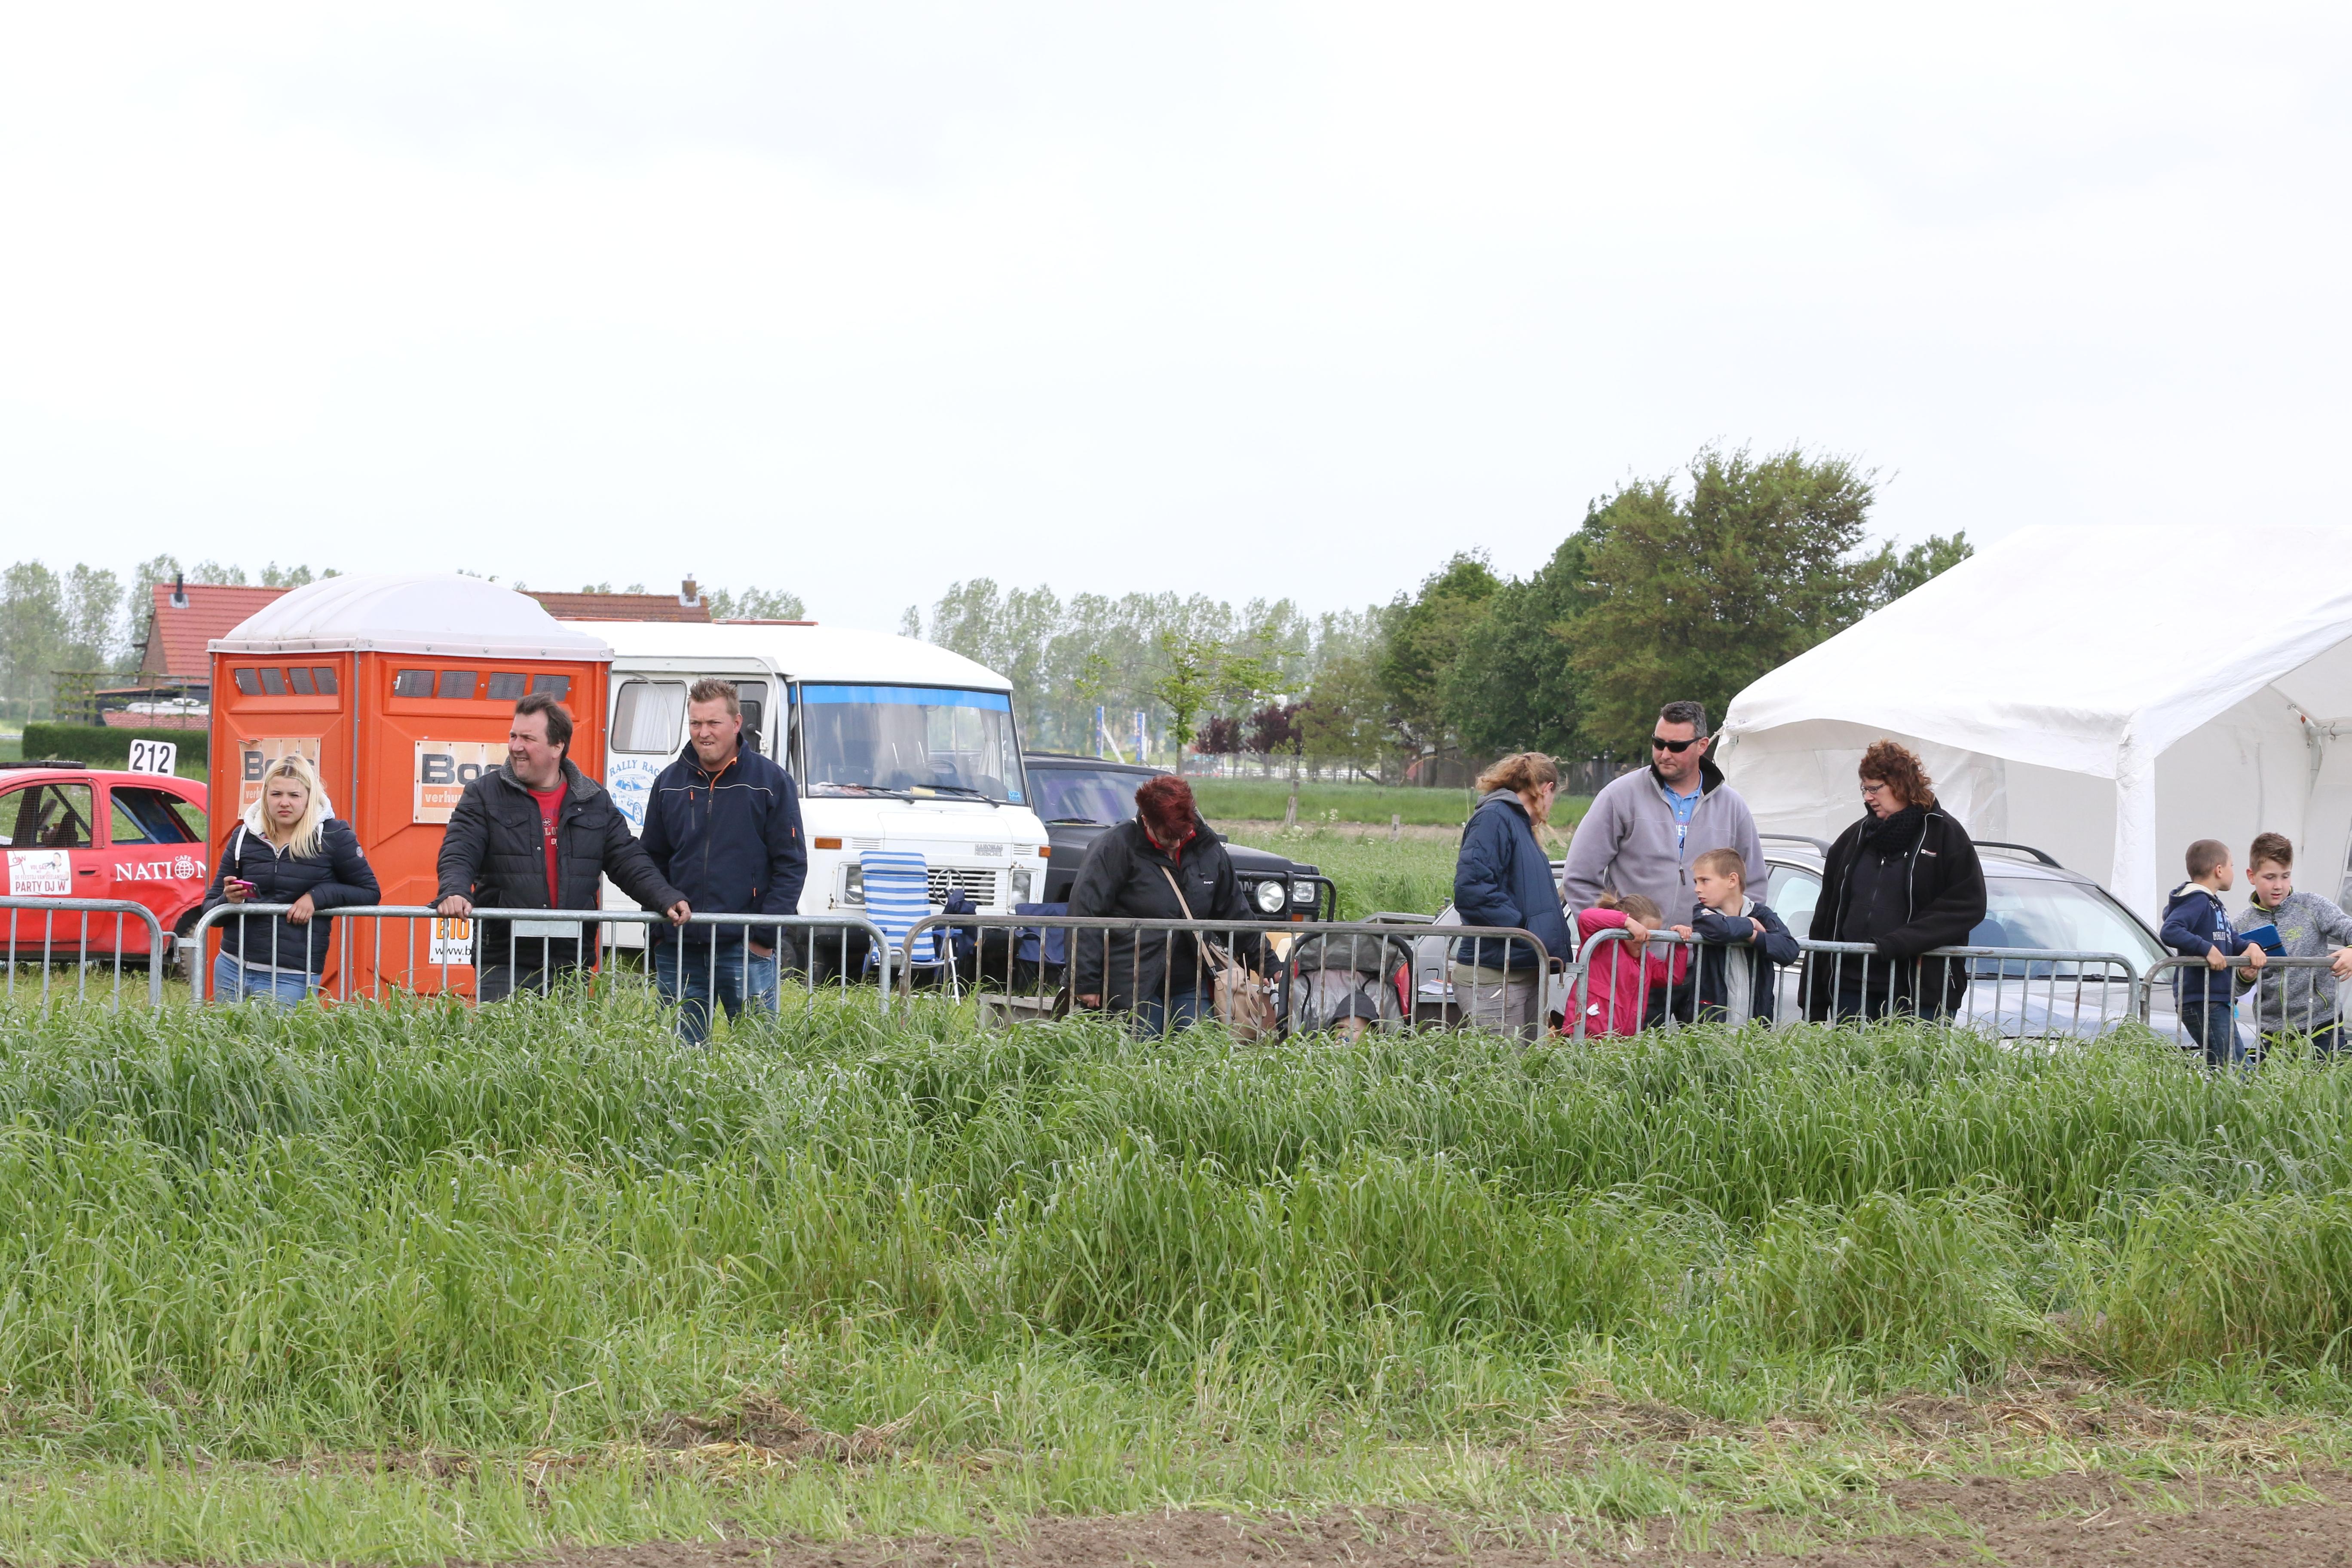 autocross sluiskil 14-5-2016 196